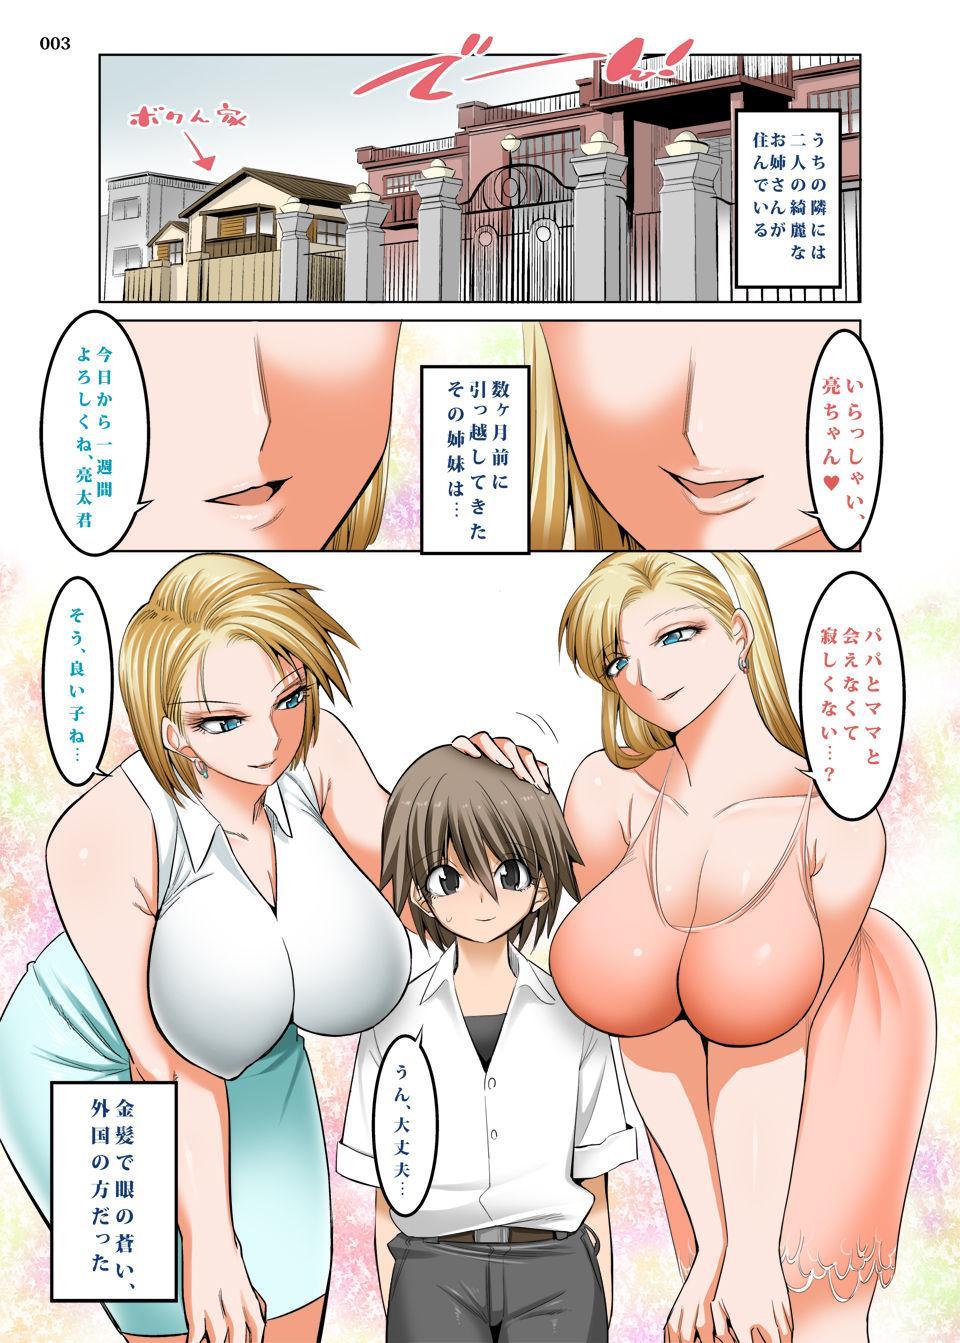 Otonari-san wa Gaikokujin Succubus Shimai 1